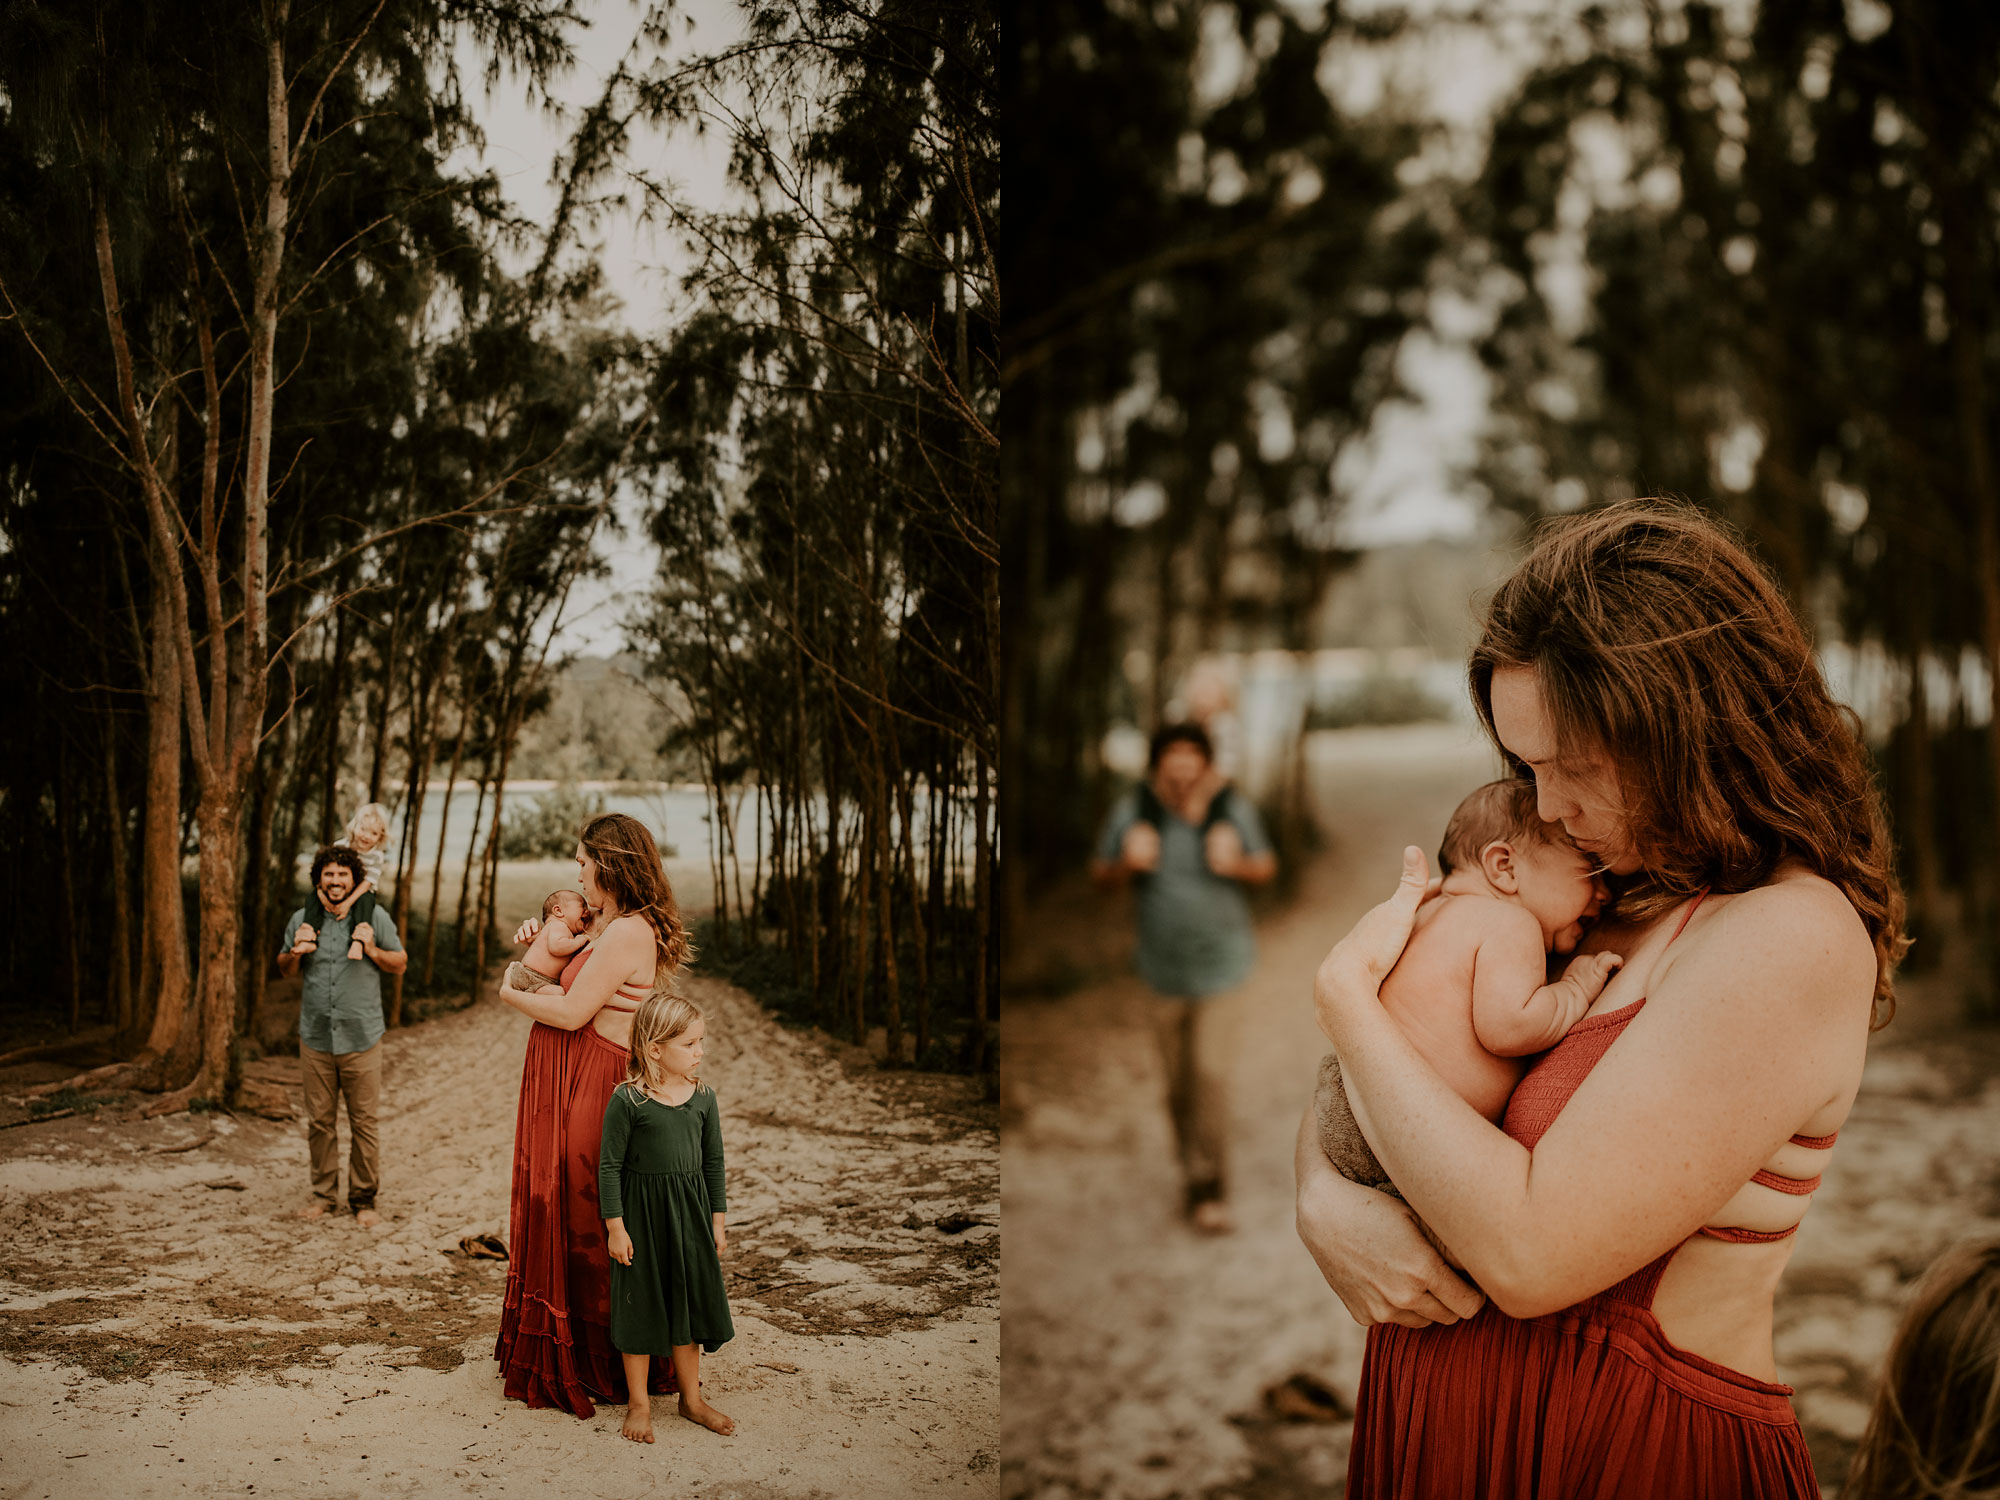 Hawaii-Outdoor-Newborn-Photography-24.jpg